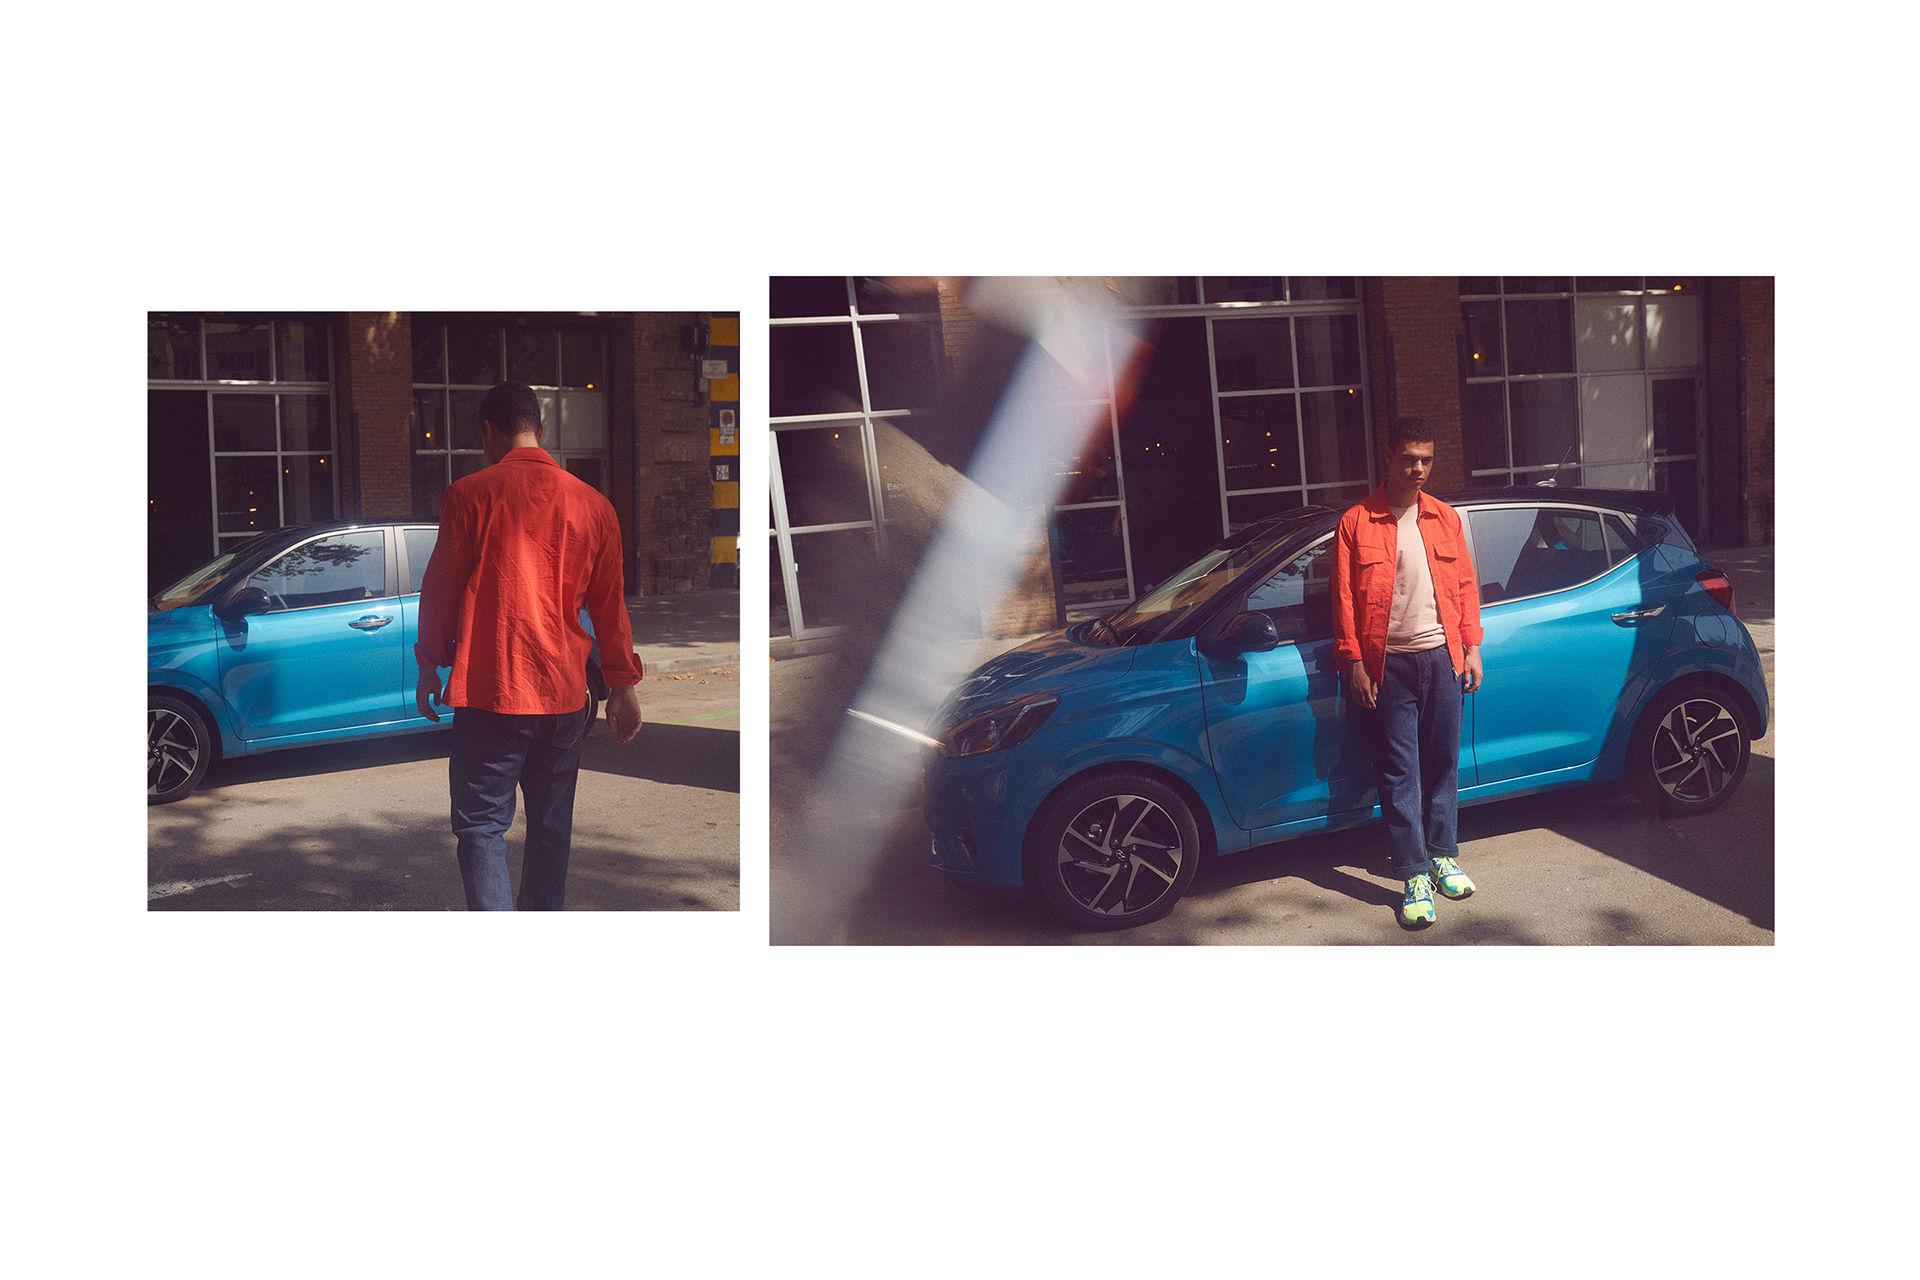 All New Hyundai i10 Campaign shot by BAM I Part #2